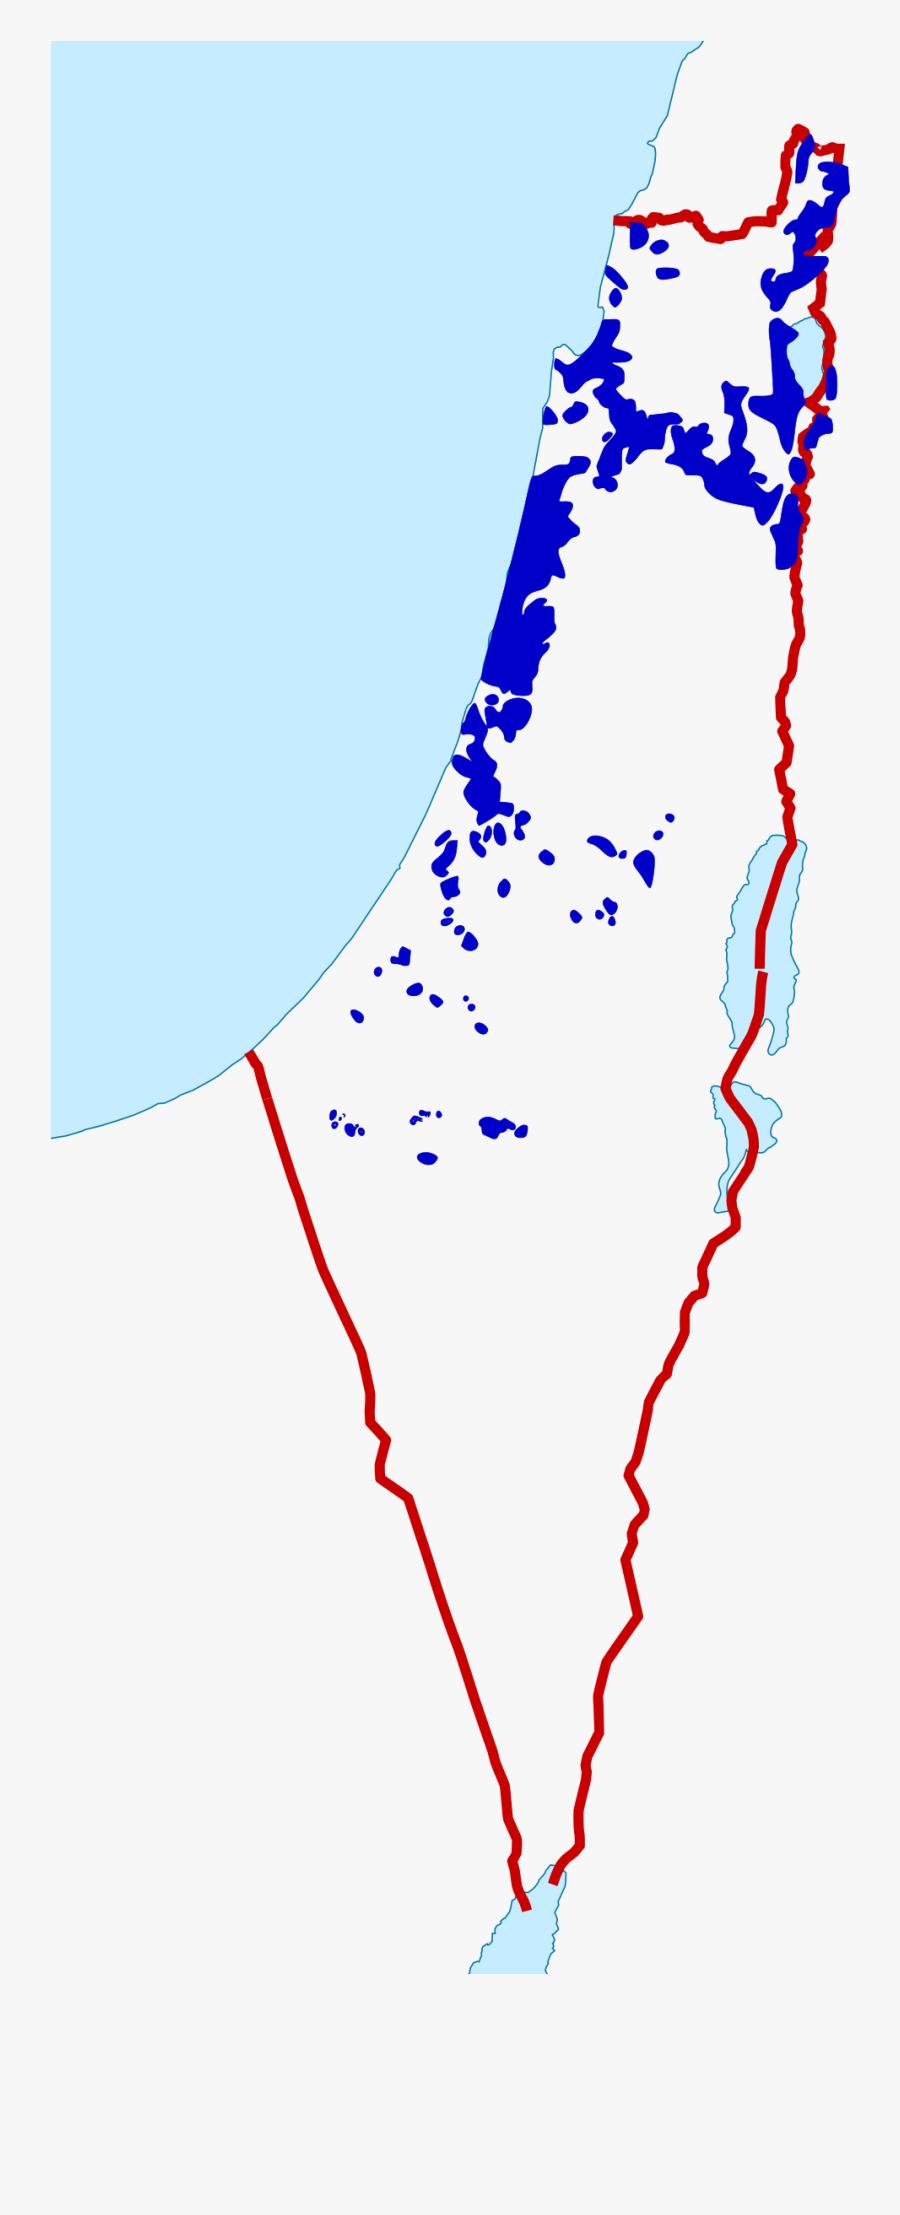 Palestine Key Words In Arabic, Transparent Clipart